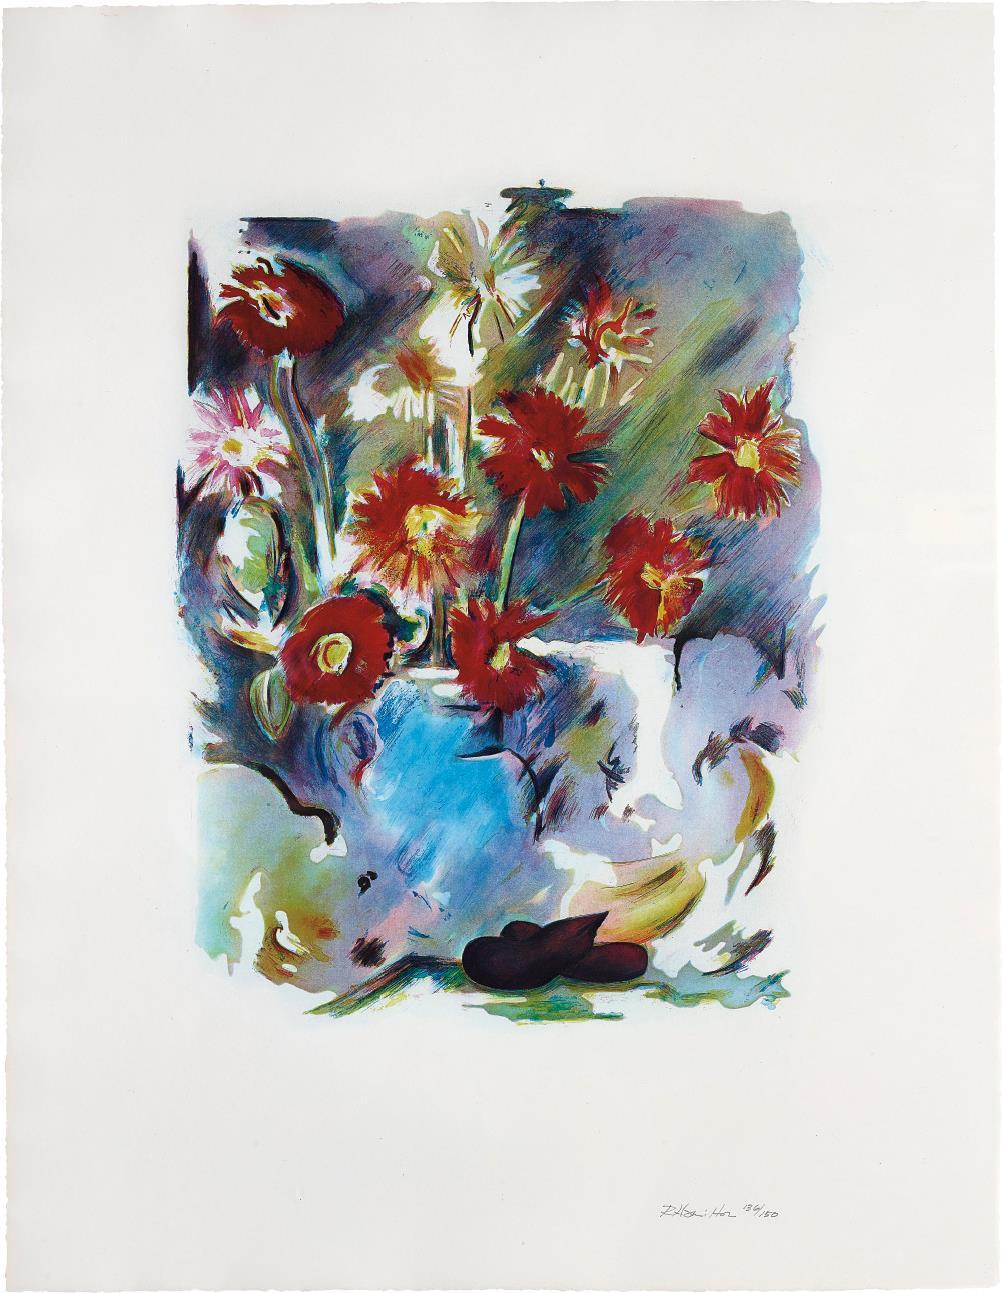 Richard Hamilton-Trichromatic Flower-Piece-1974